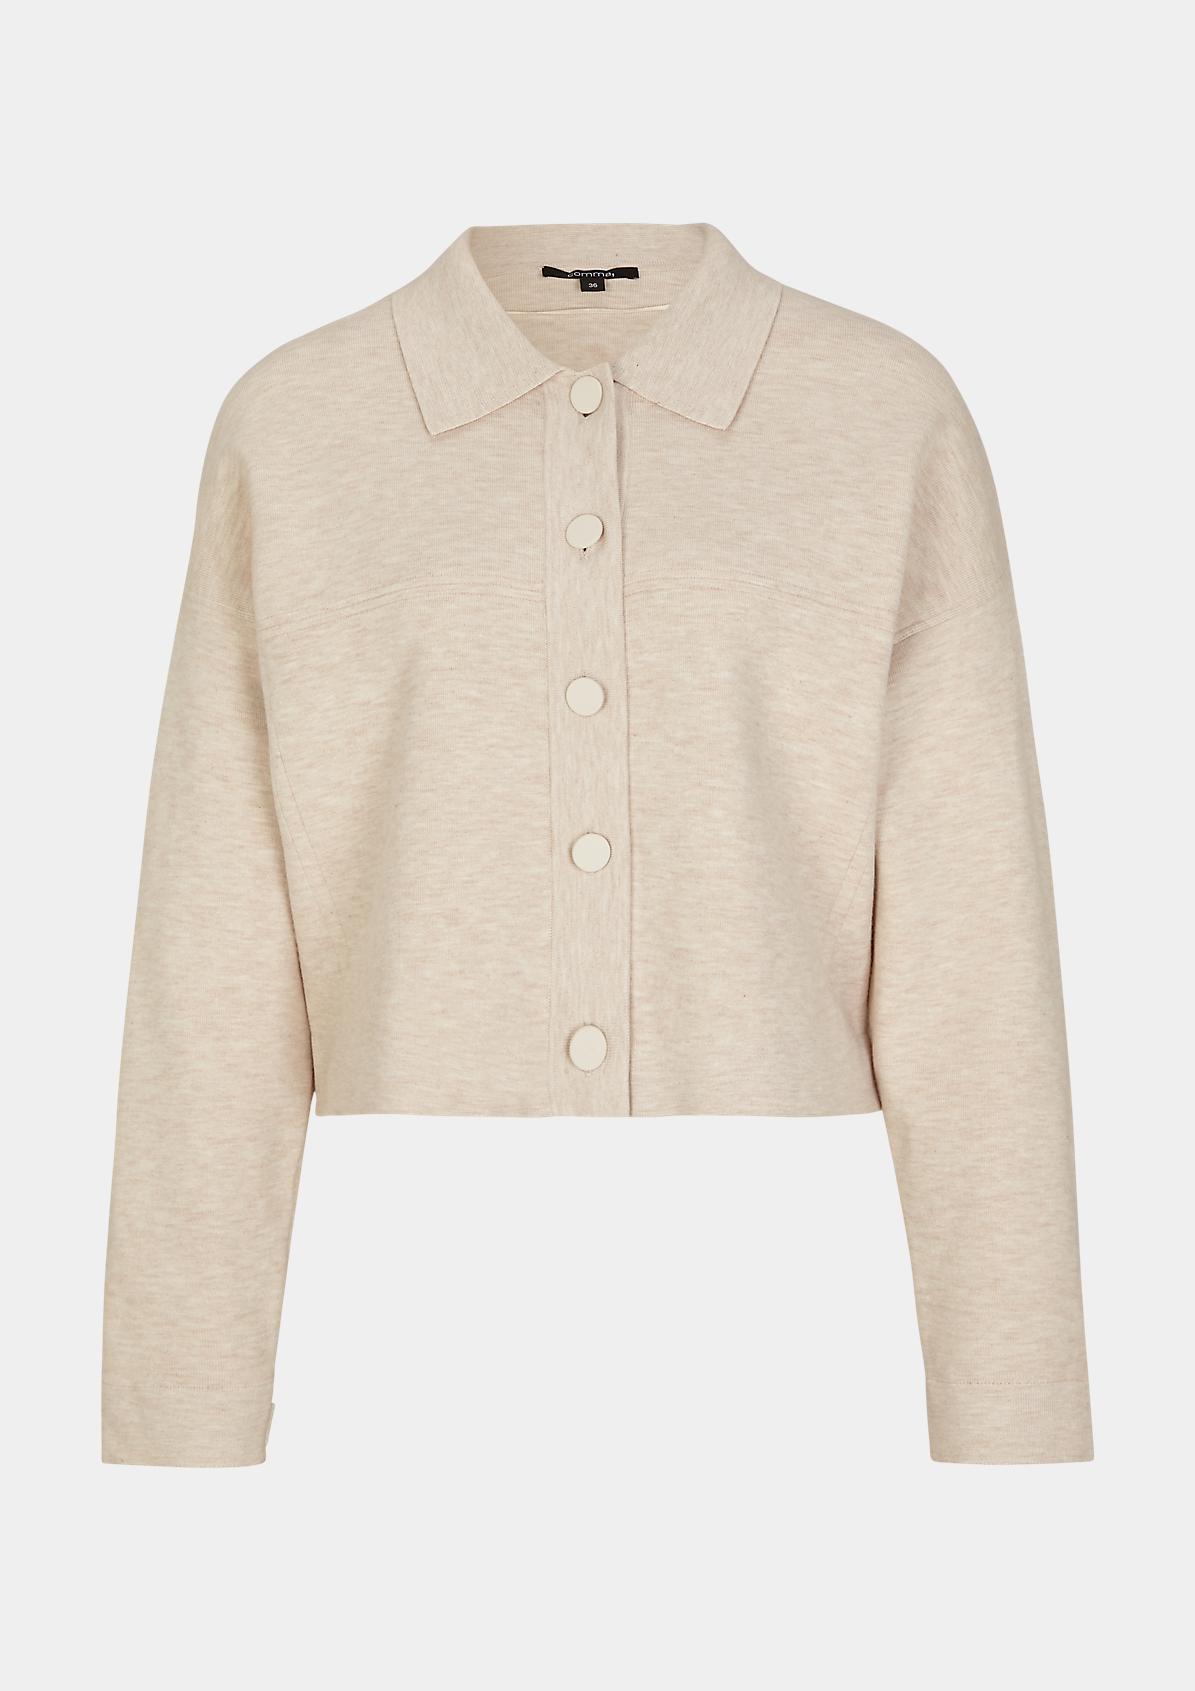 Jacke aus Viskosemix